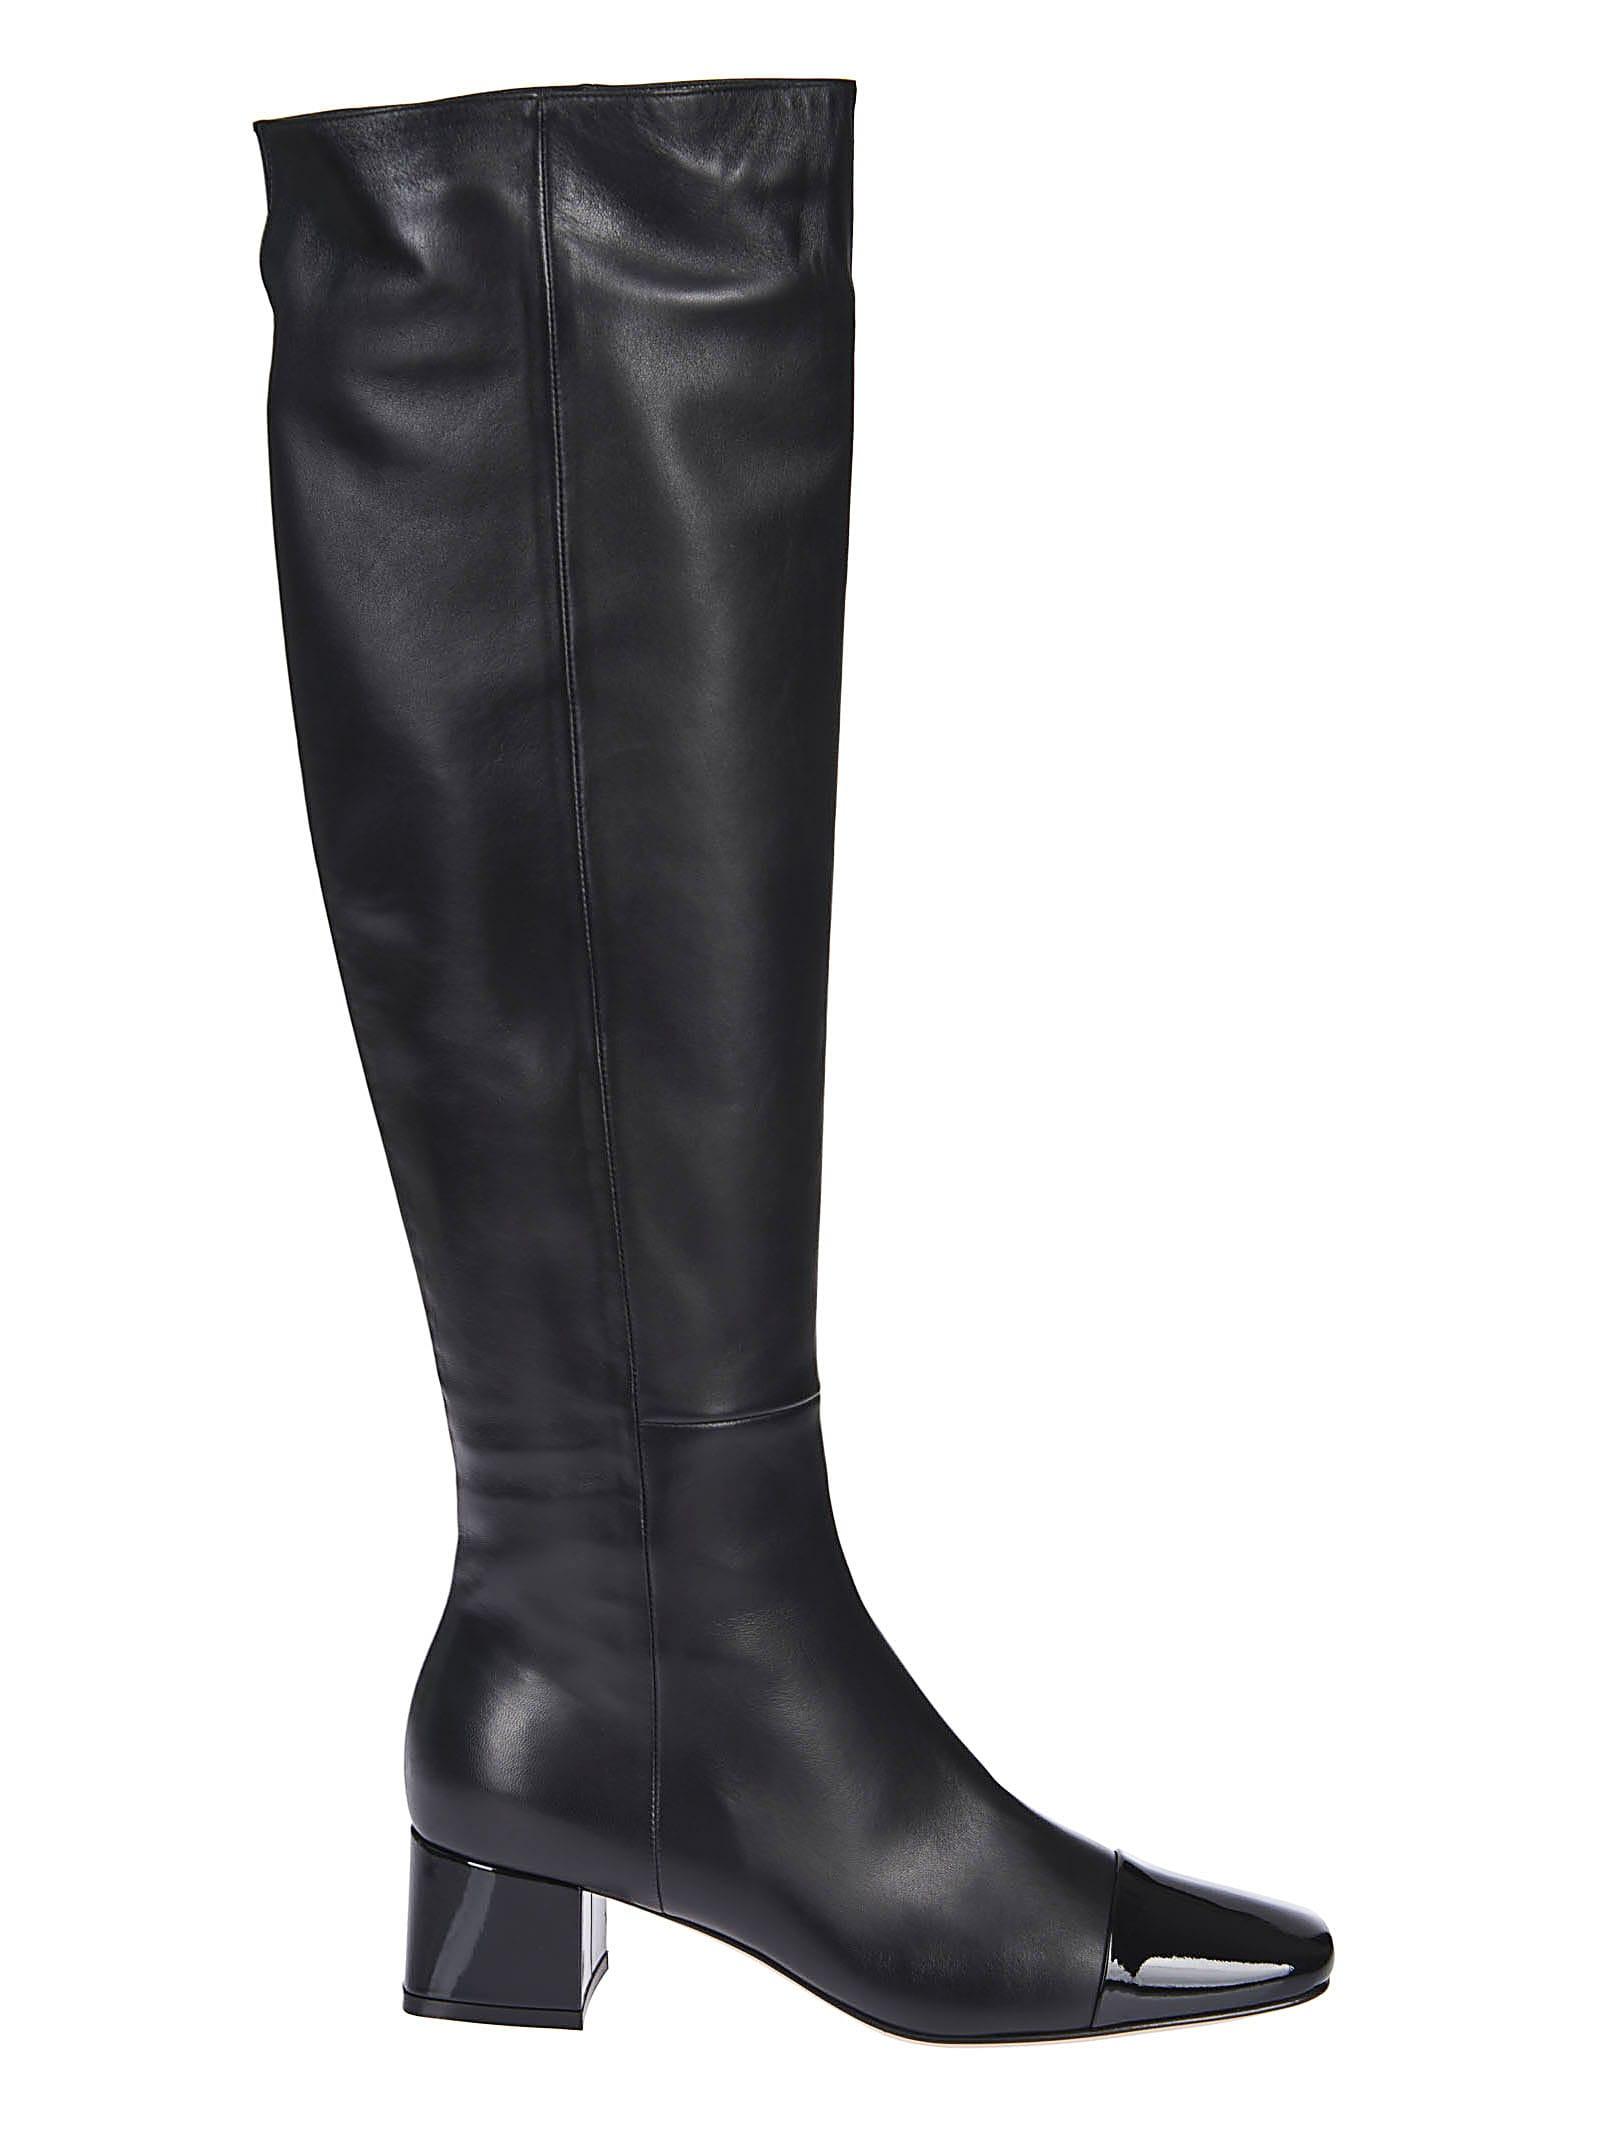 Gianvito Rossi Square Toe Over-the-knee Boots